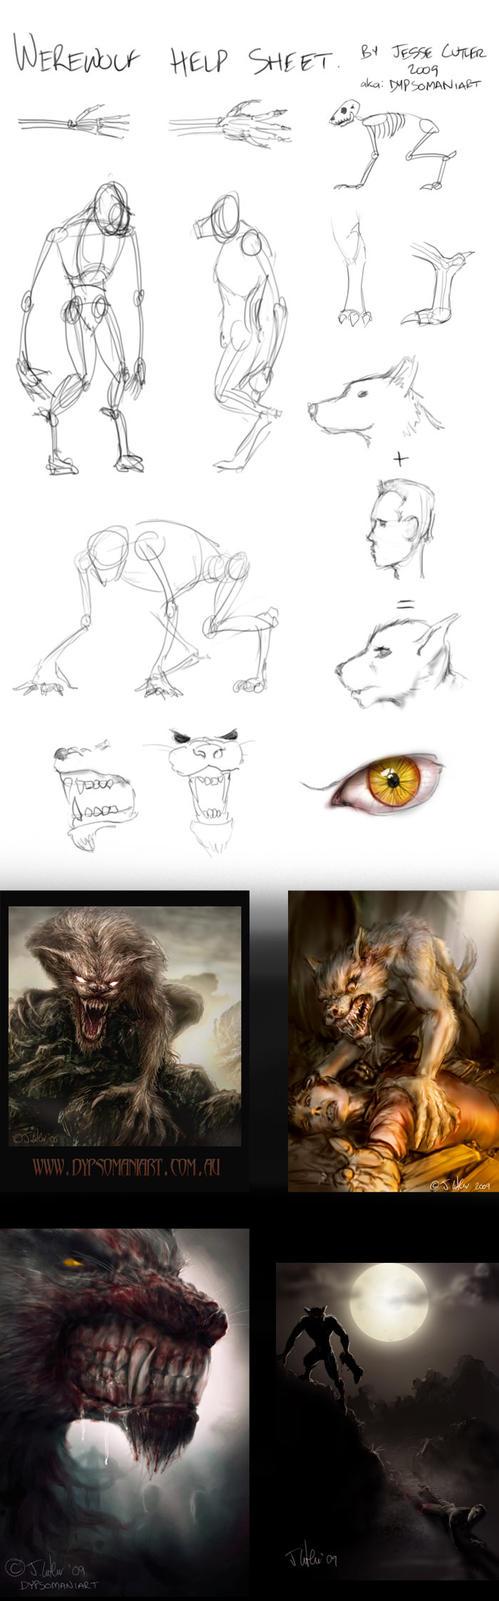 werewolf help sheet by dypsomaniart